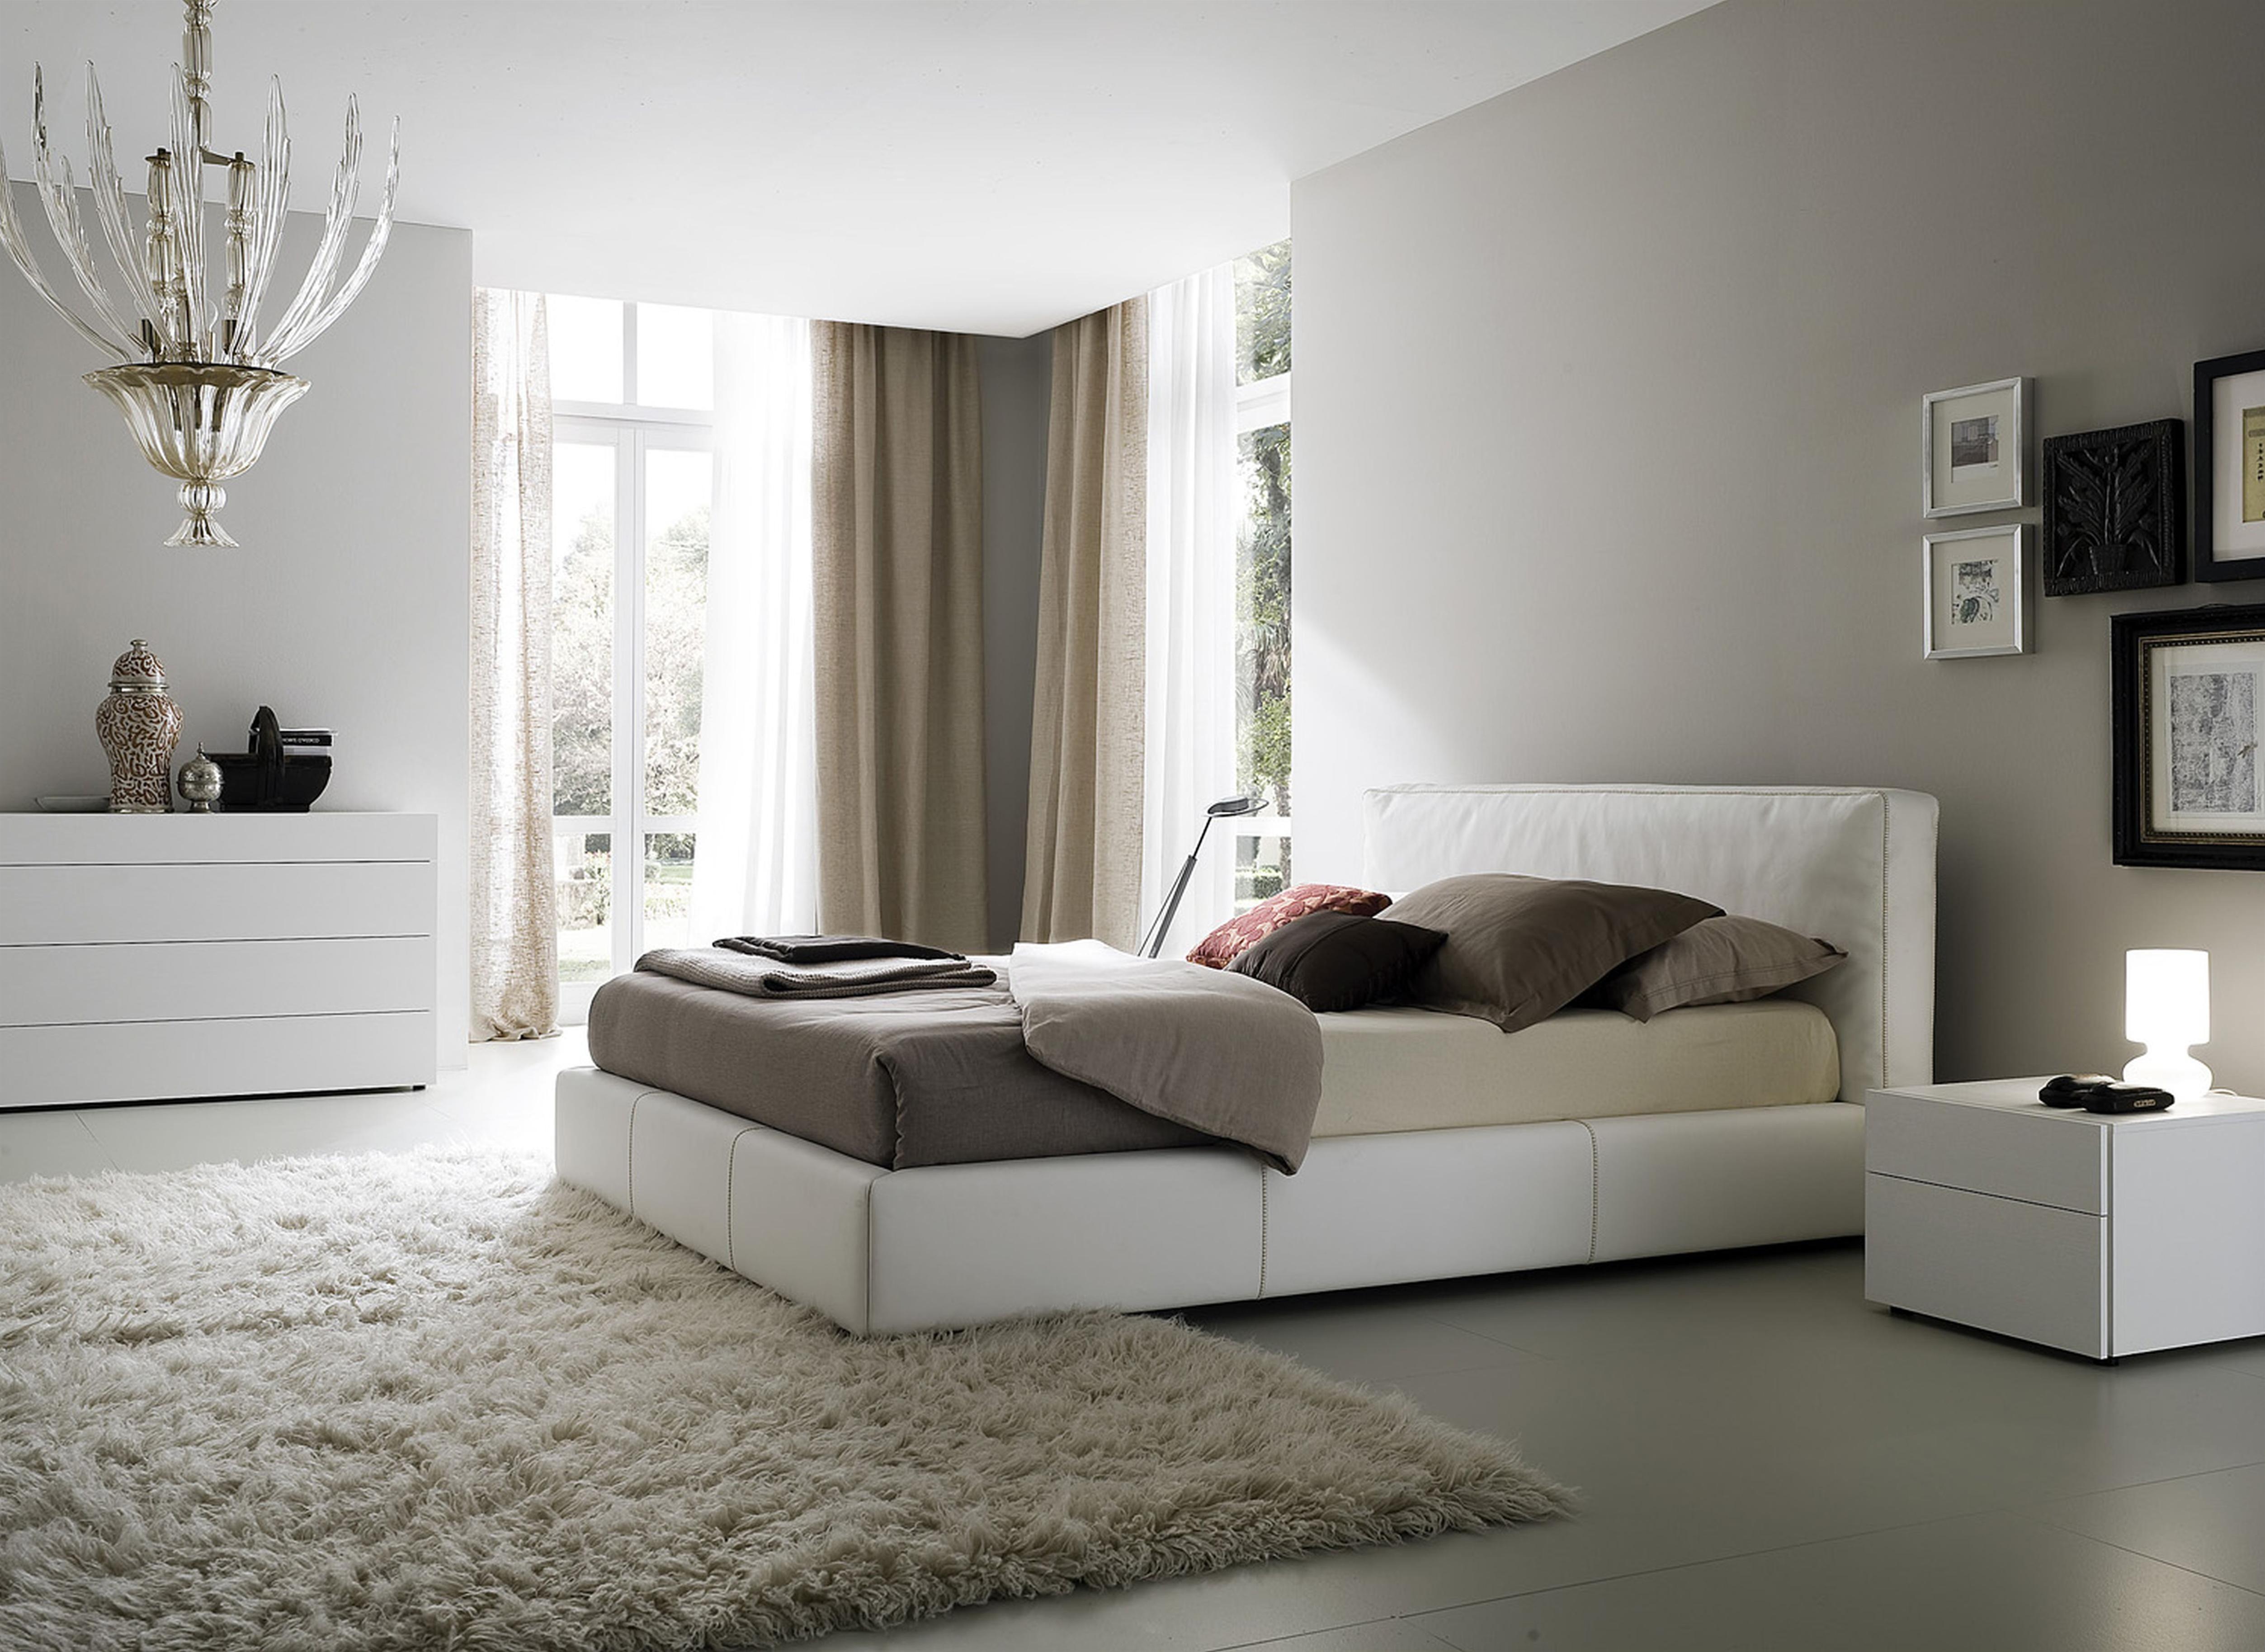 Bedroom Interior Design Designing a master bedroom interior is